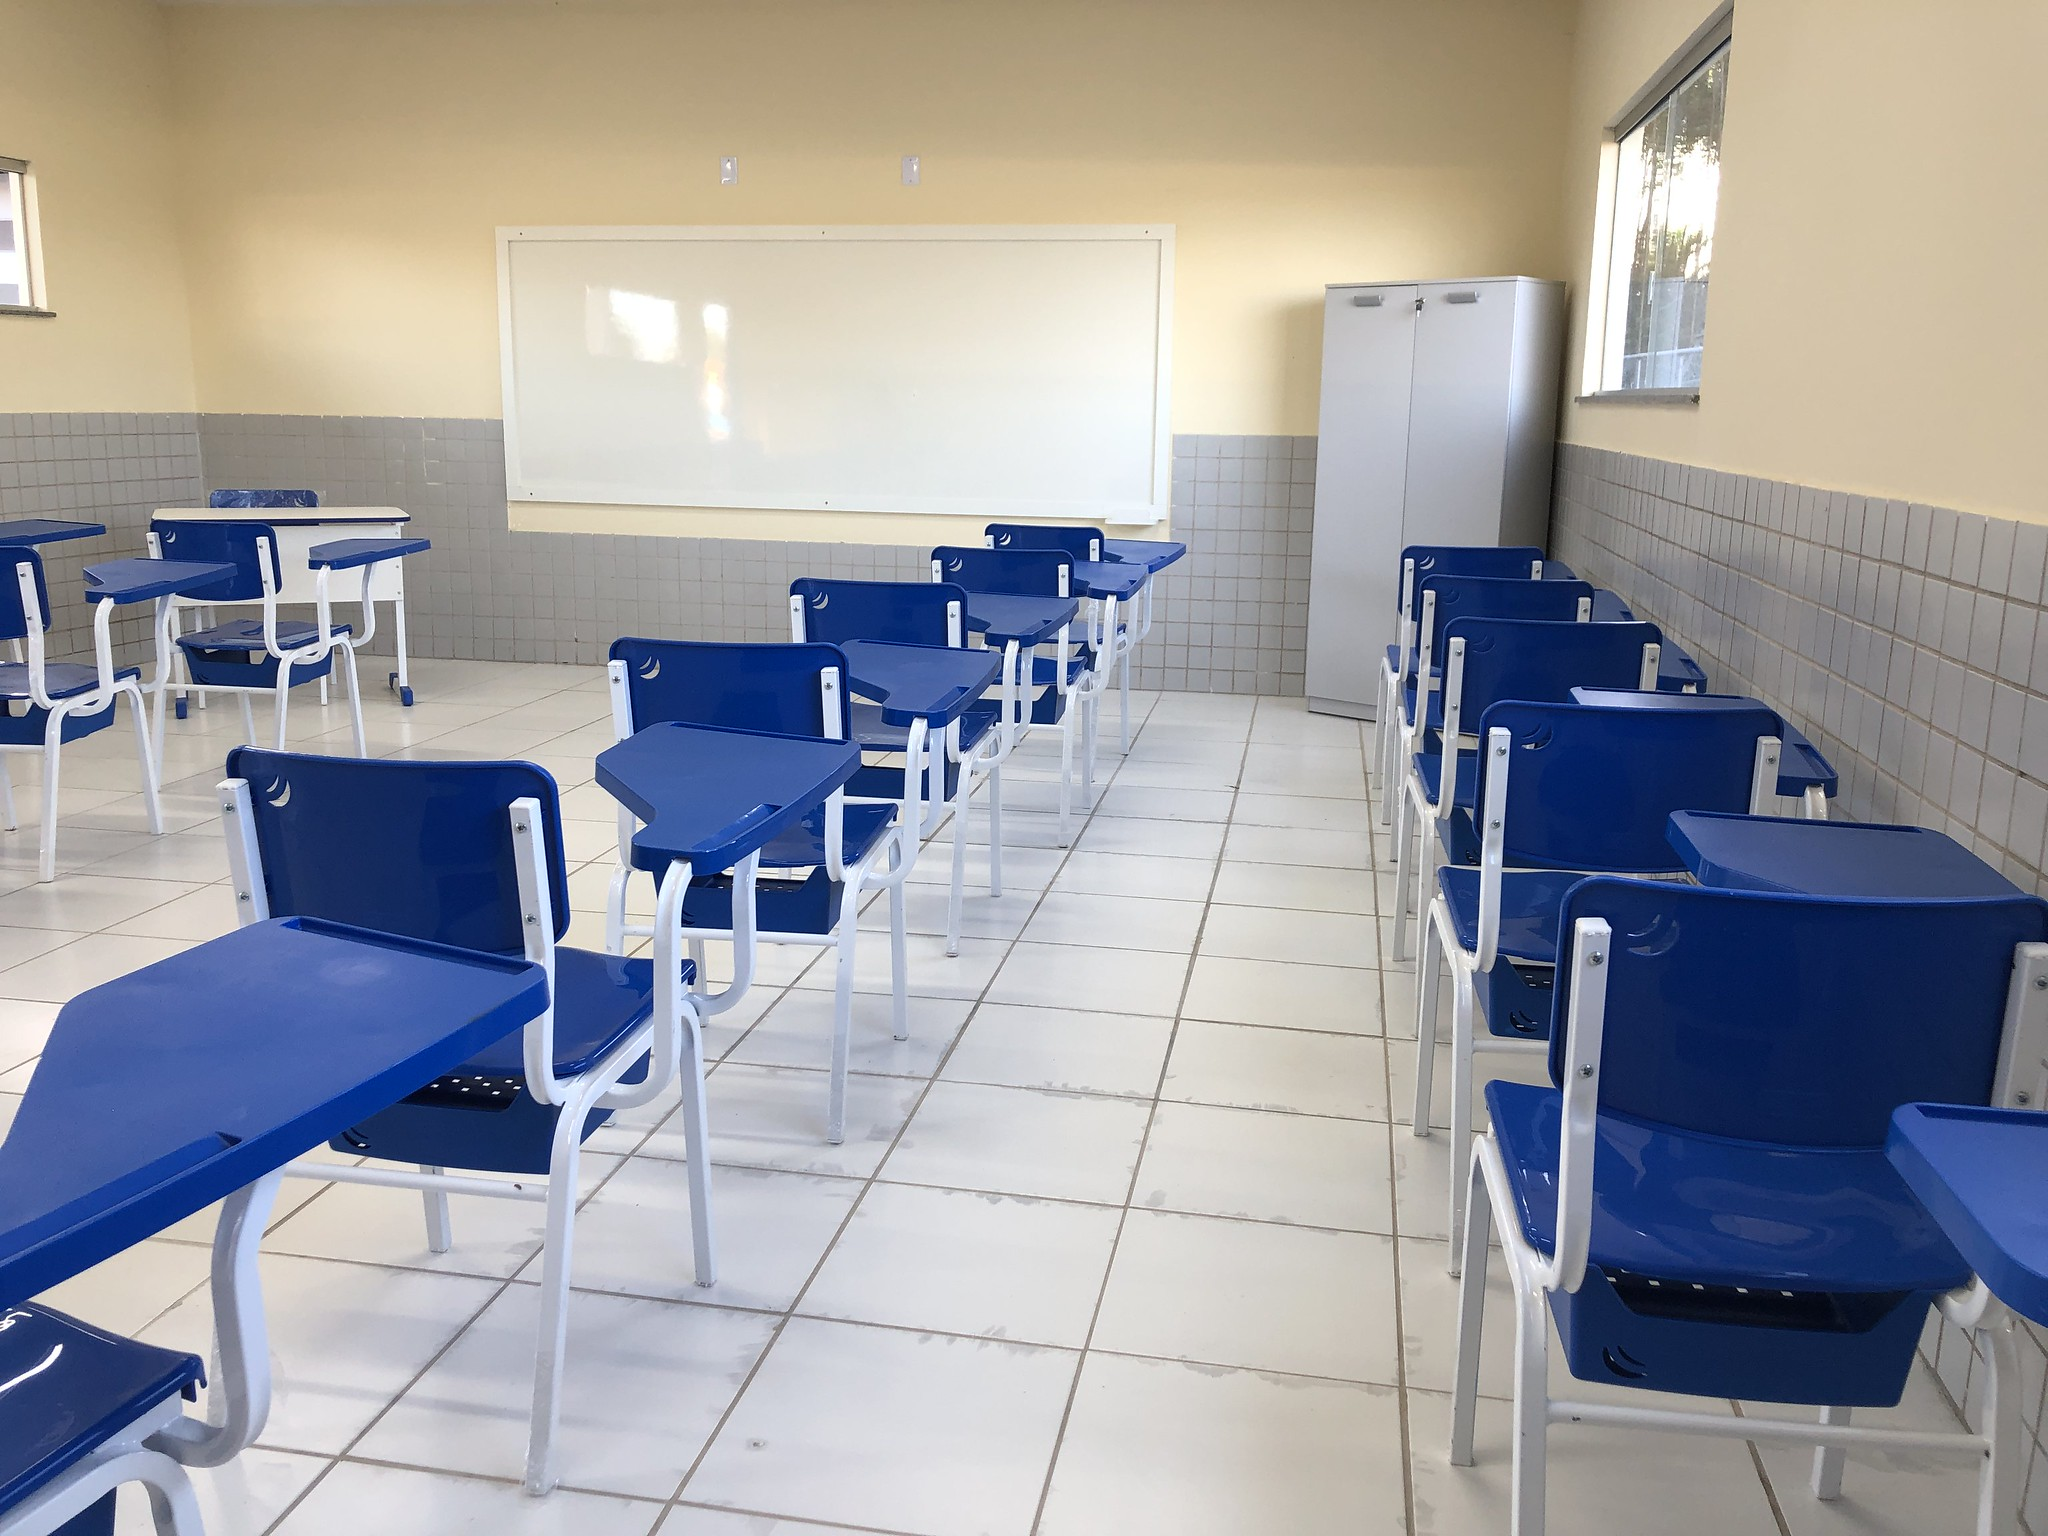 INAUGURA DA EMEF SANDRA LIMA NO CANTA GALO (164)